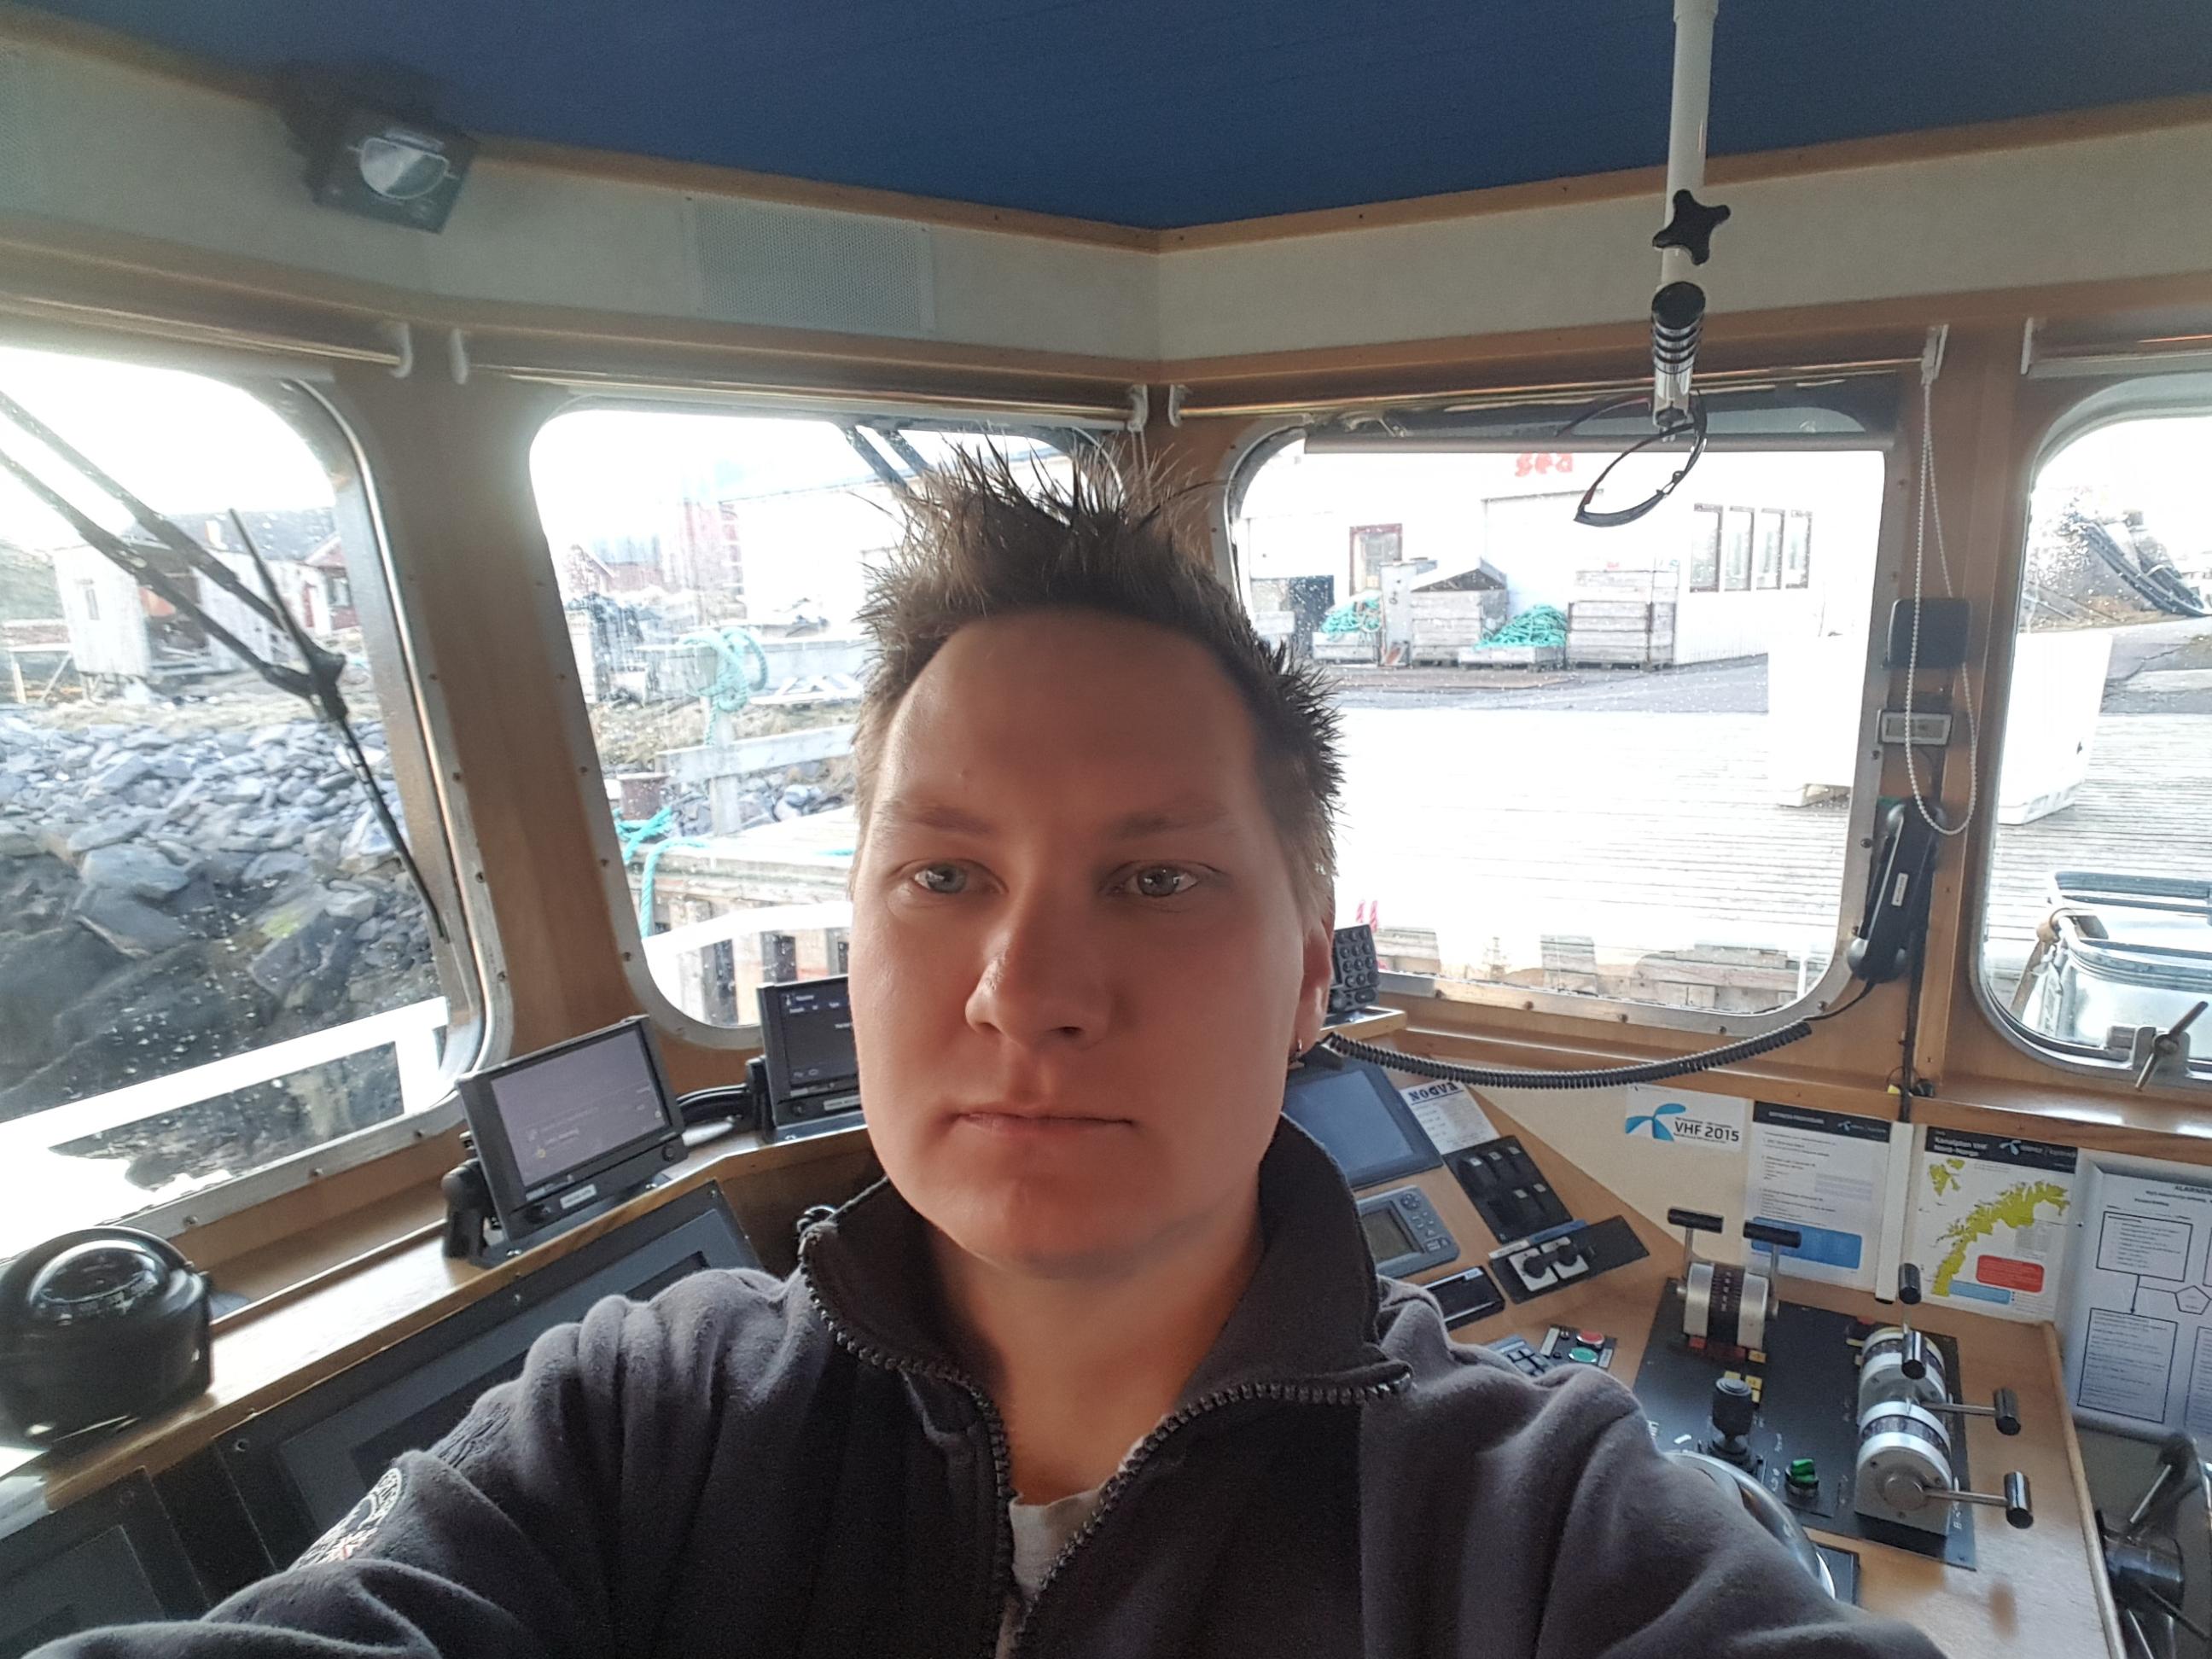 Kristoffer Hansen om bord på båten han jobbar på.